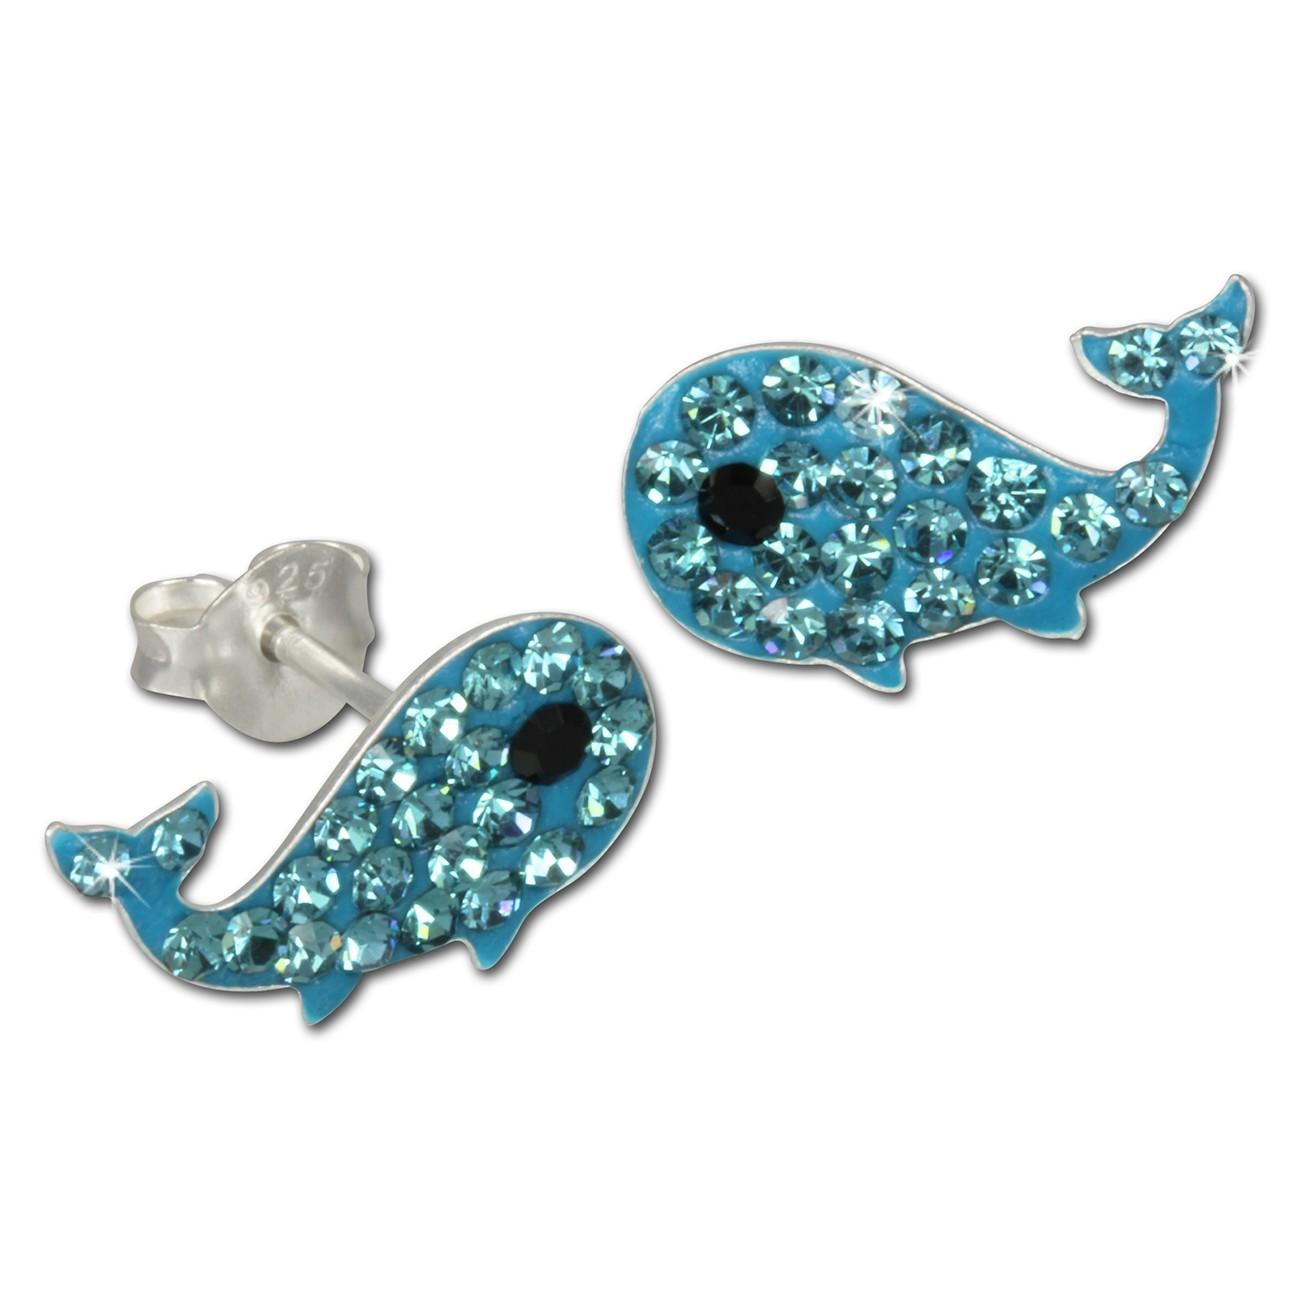 Kinder Ohrring Wal blau Silber Ohrstecker Kinderschmuck TW SDO8001H